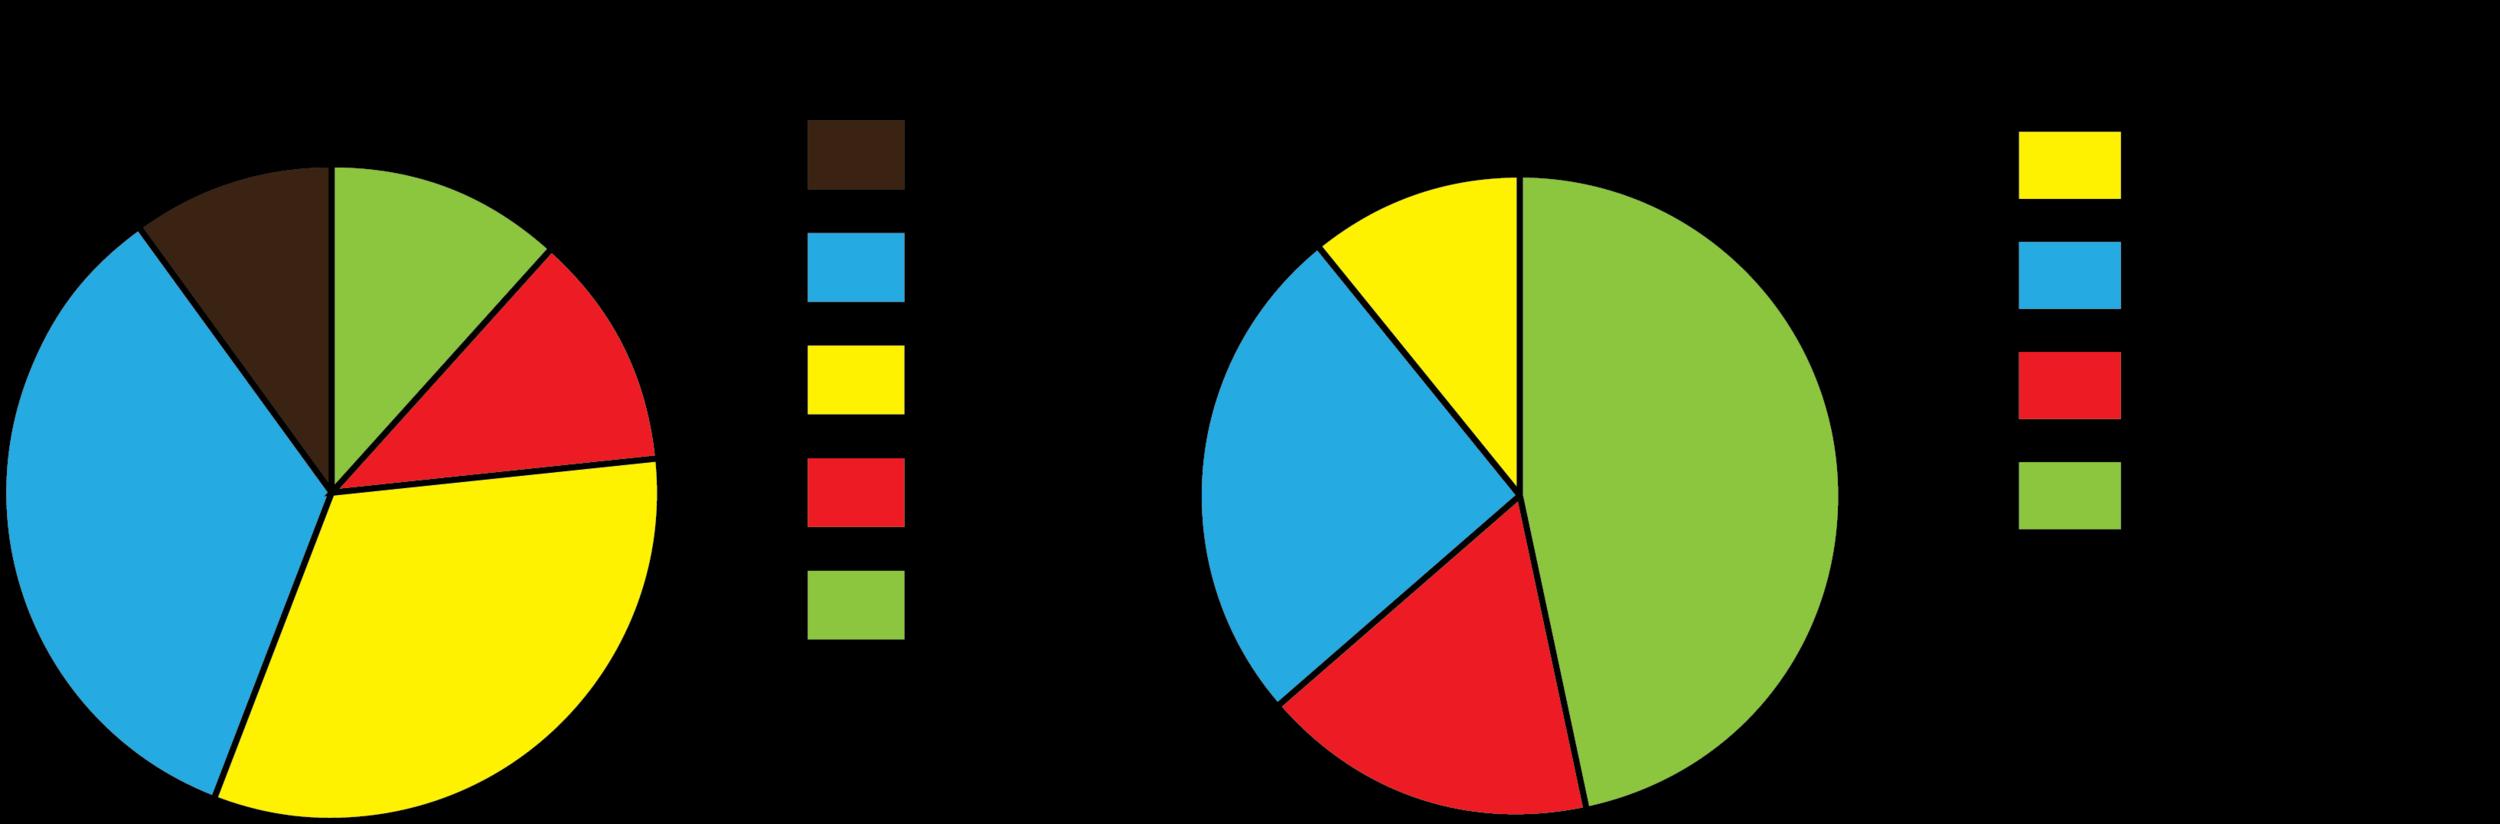 2018 income break down color.png